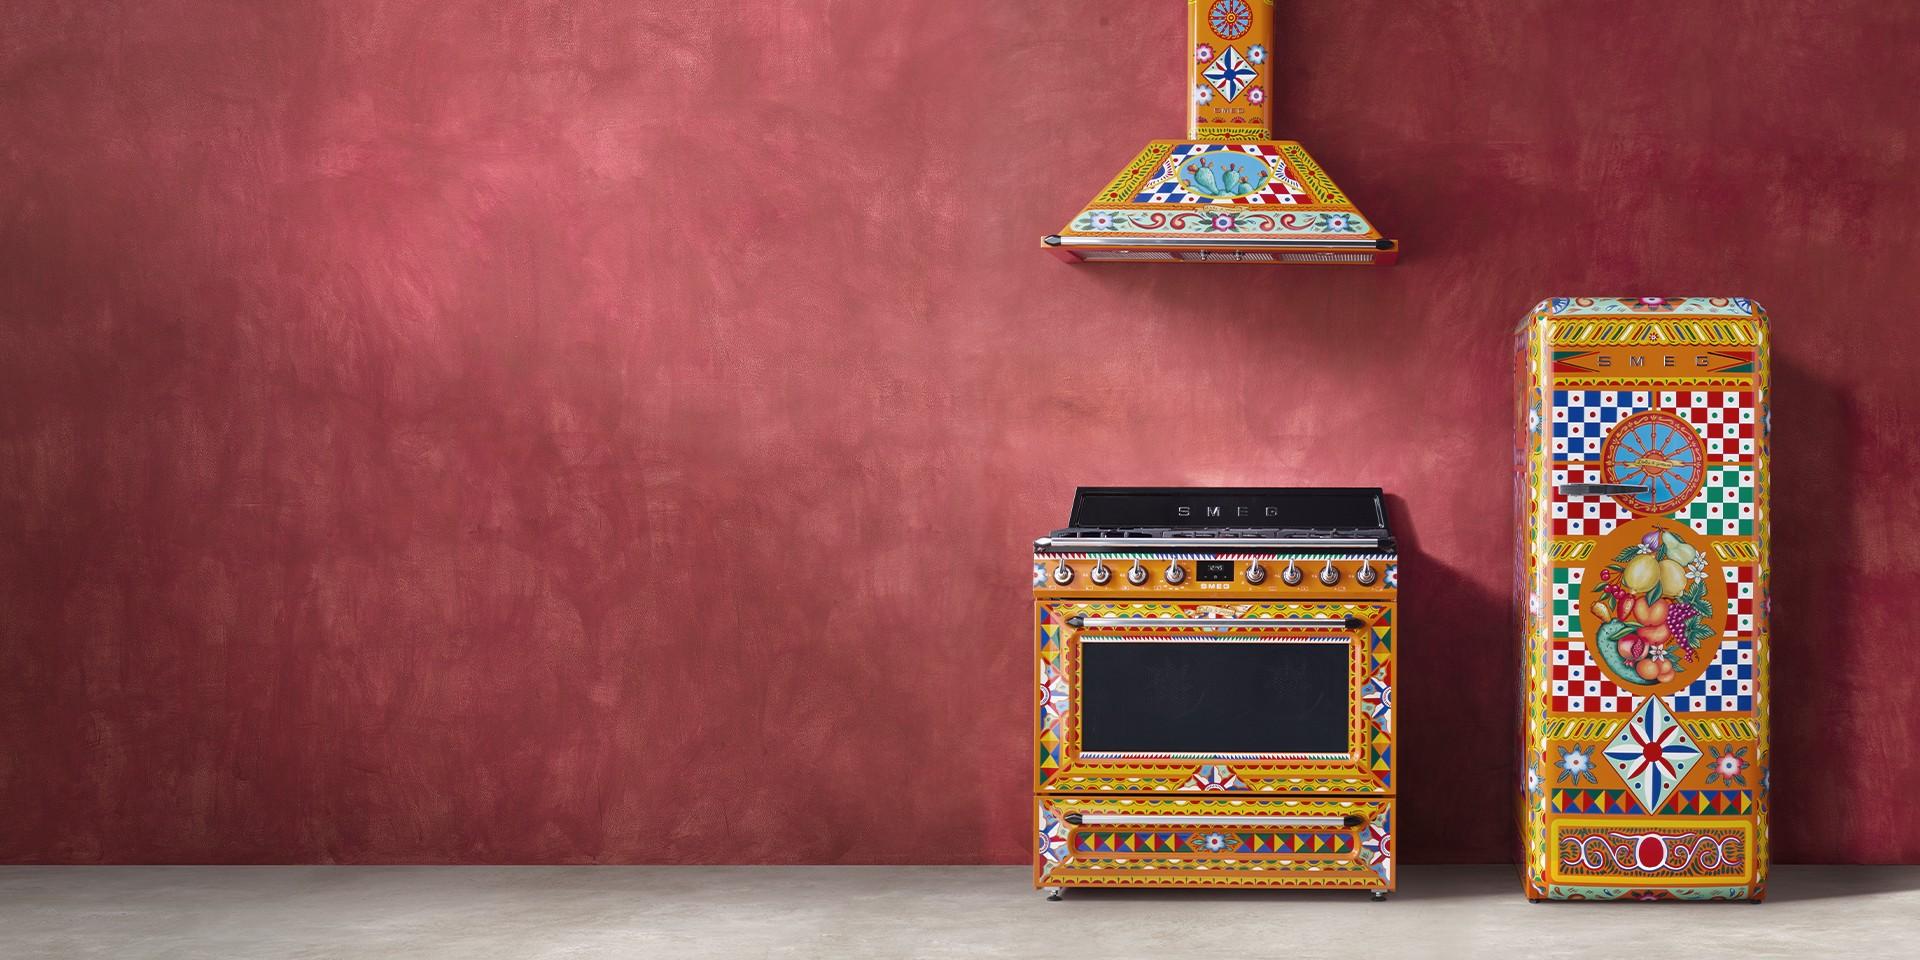 Home domestic appliances Smeg and Dolce&Gabbana